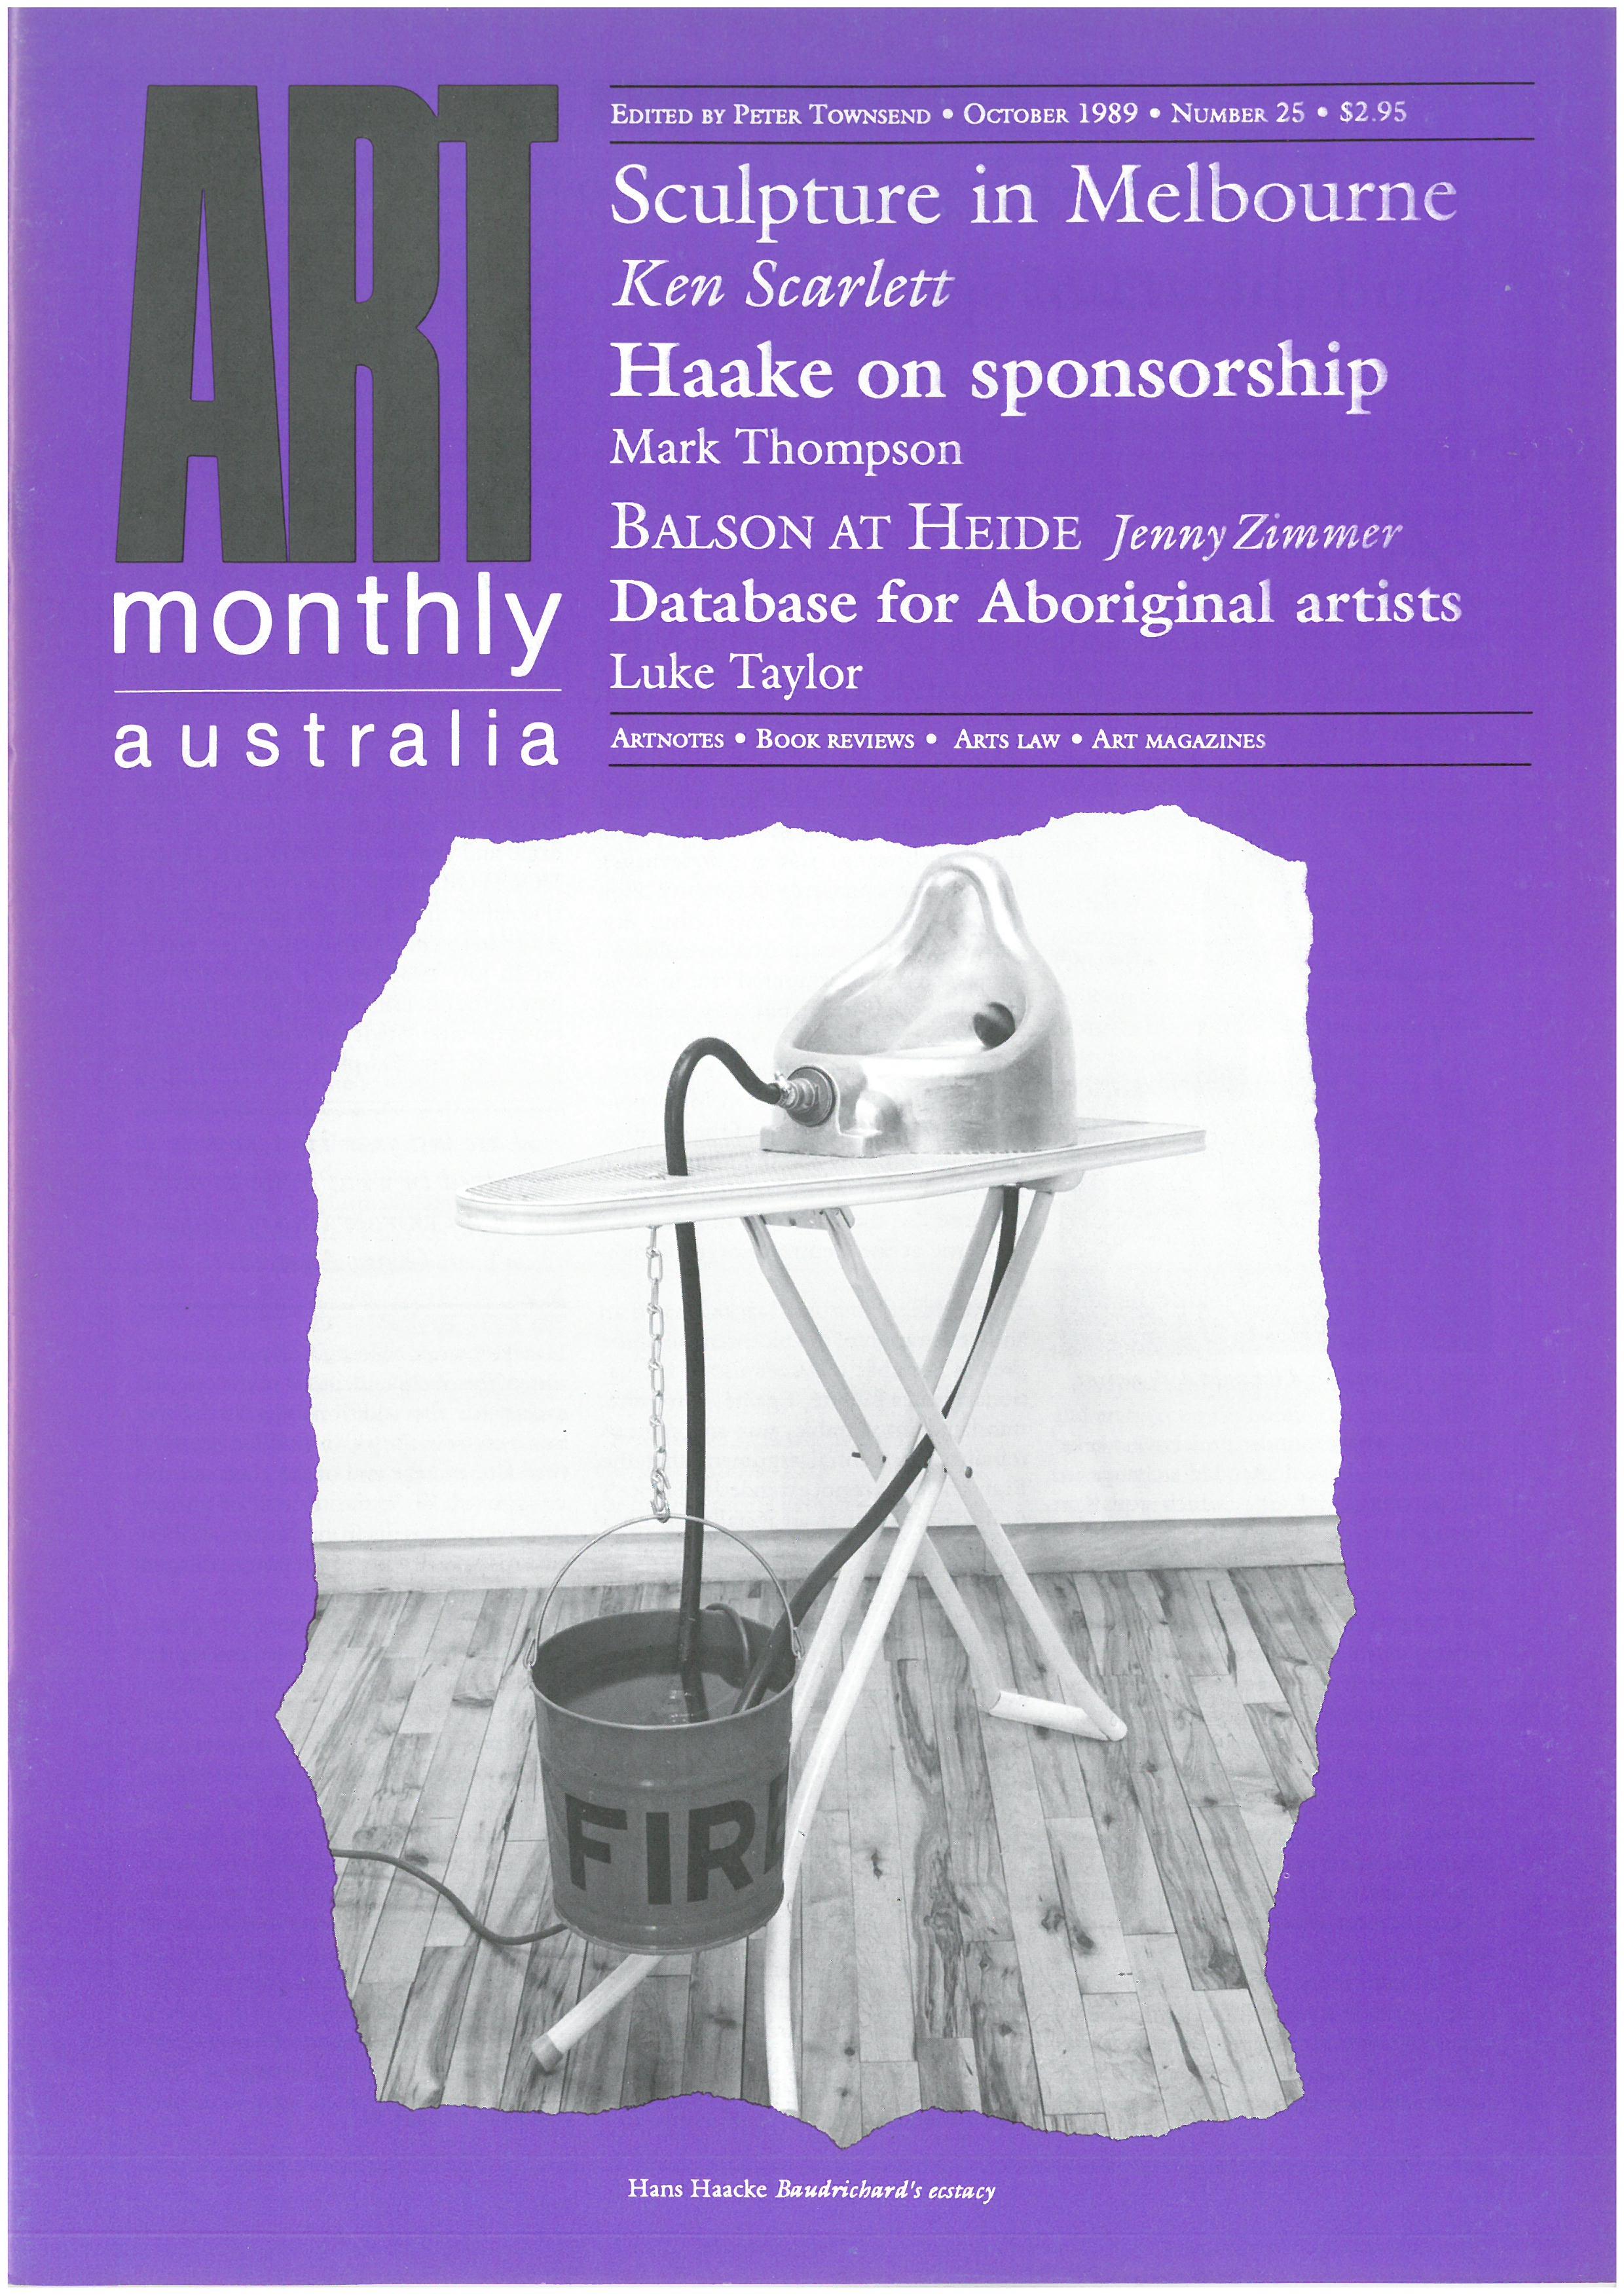 Issue 25 Oct 1989